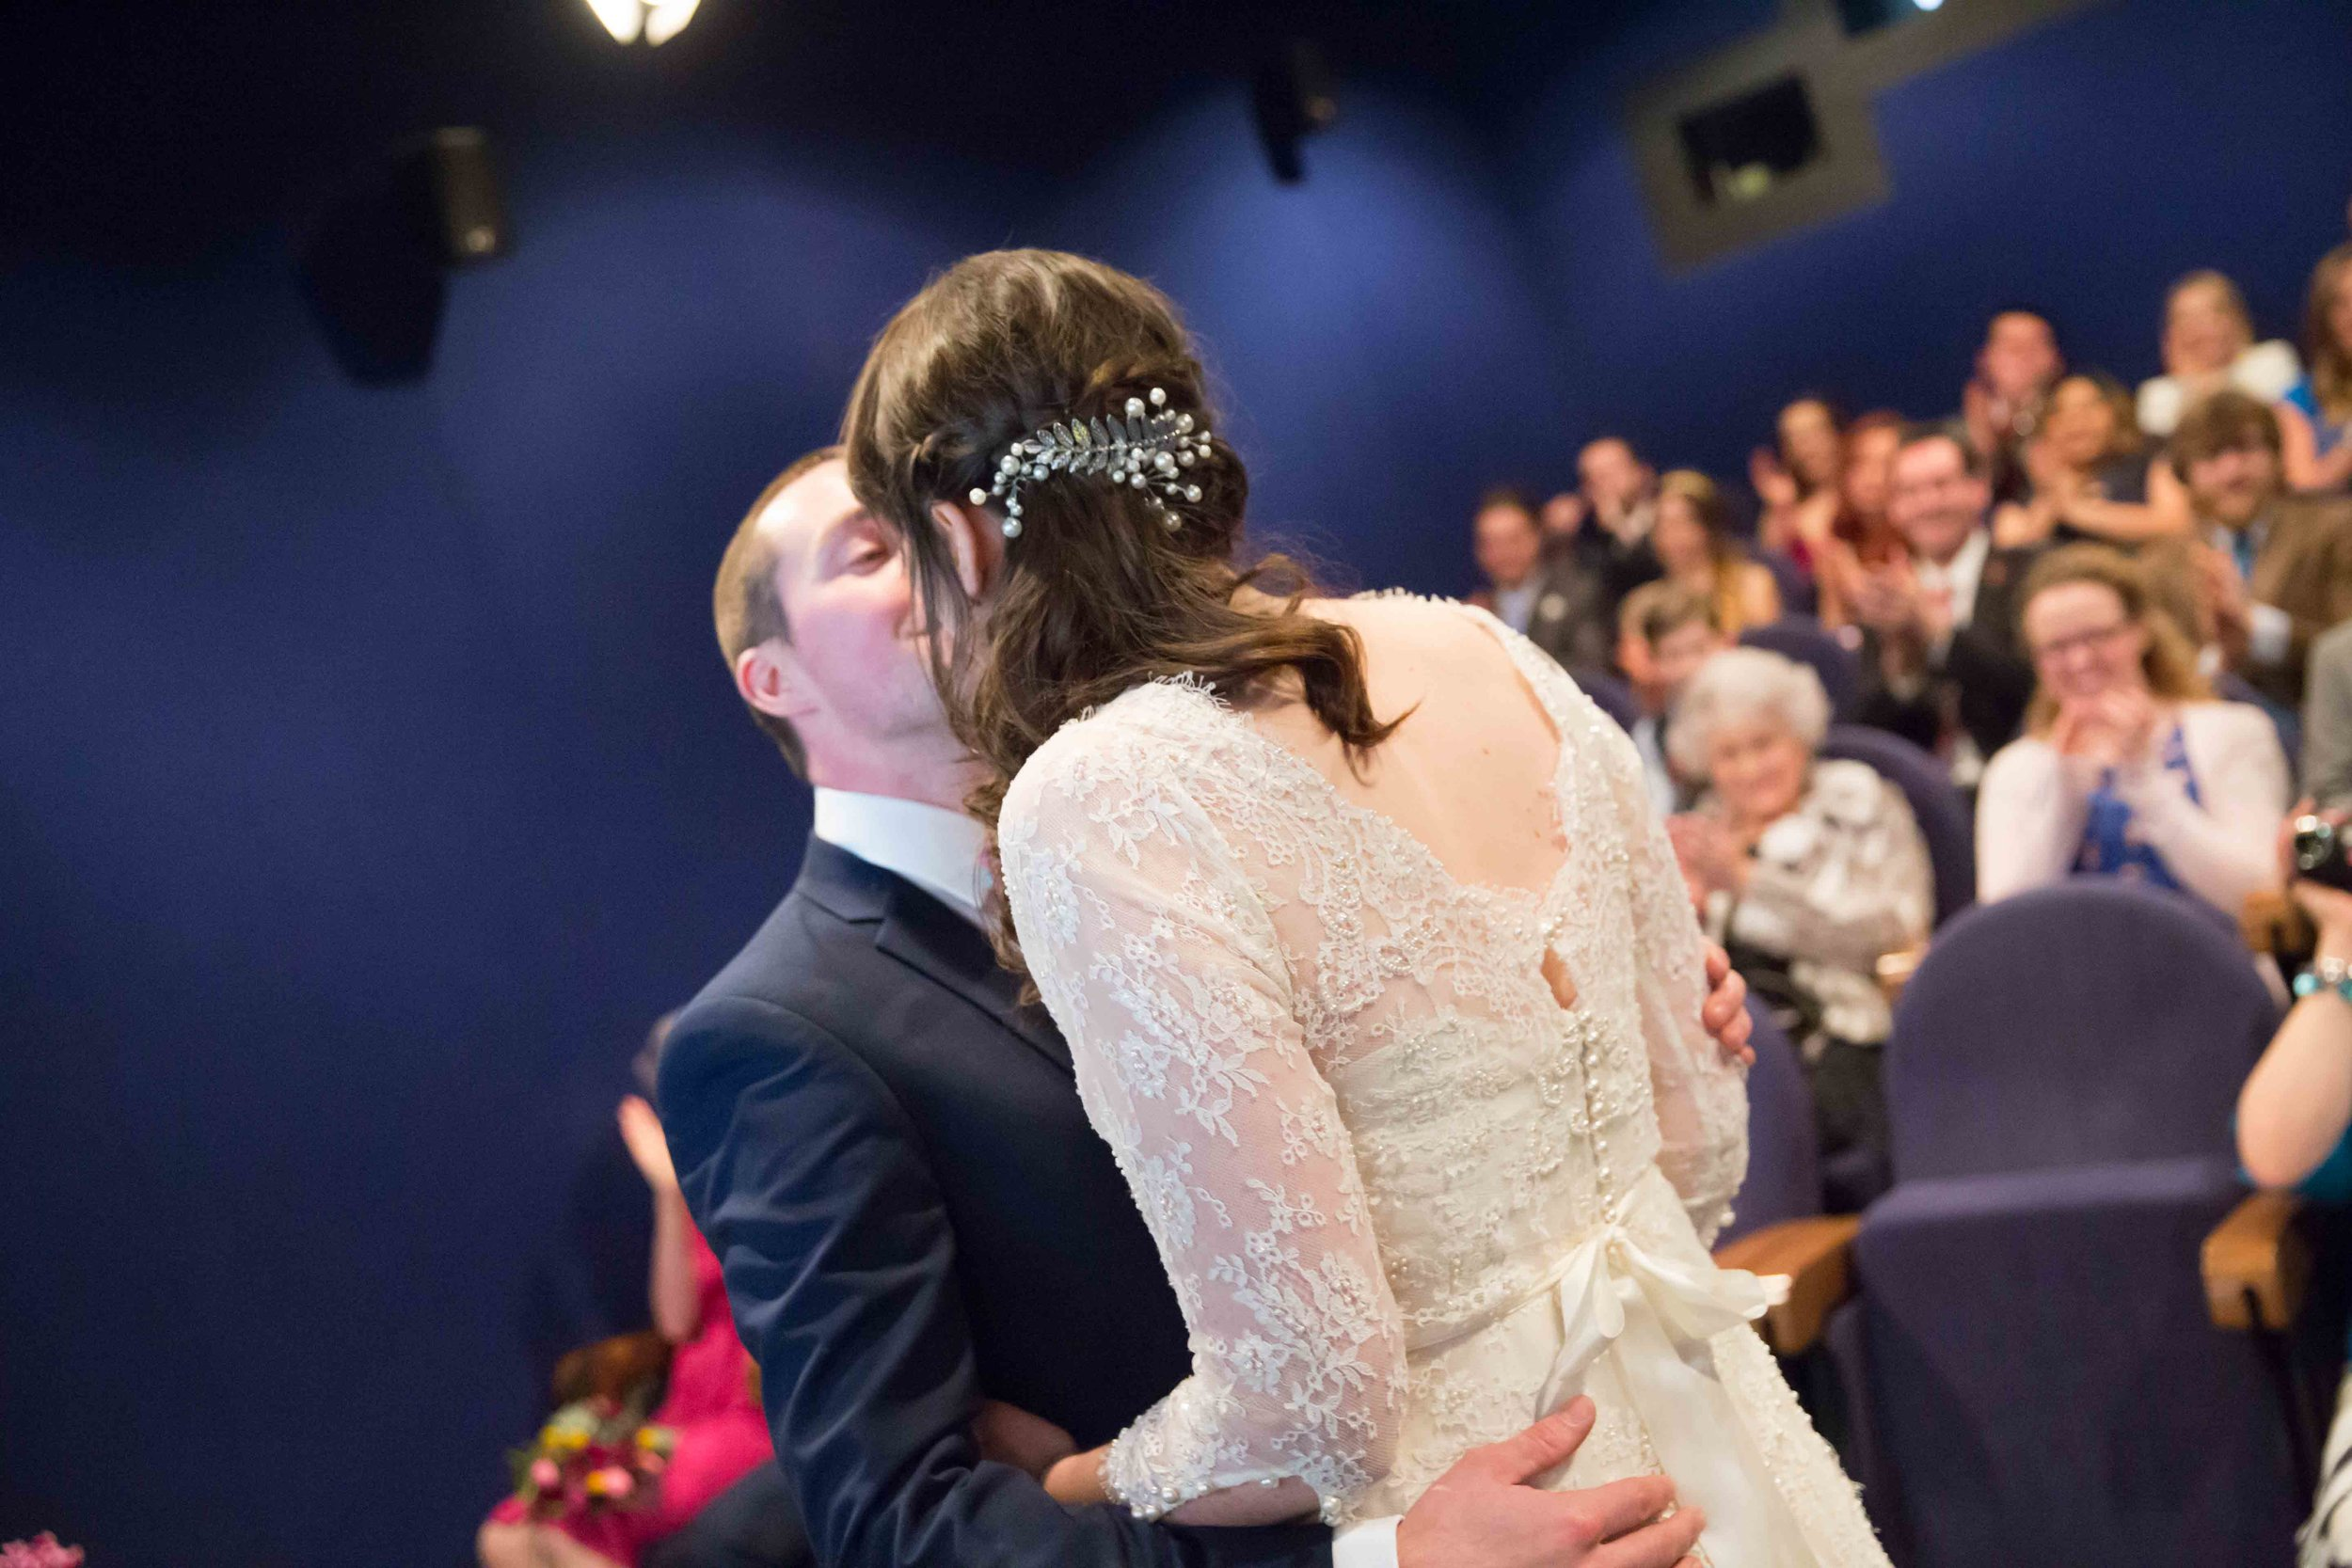 Adam & Faye - Wright Wedding Photography - Bristol Wedding Photographer -130.jpg